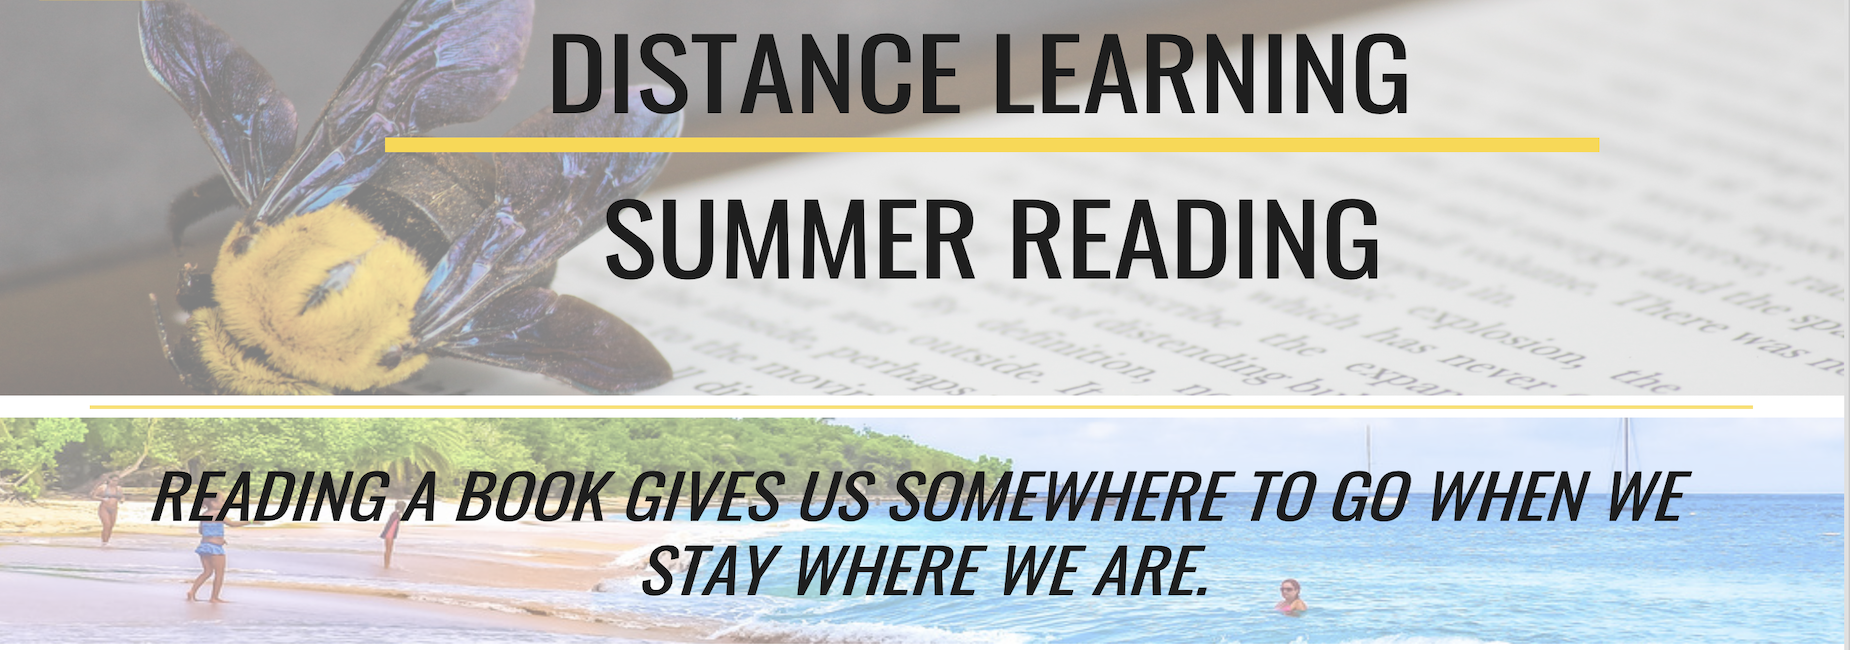 Summer Reading Link Click Banner